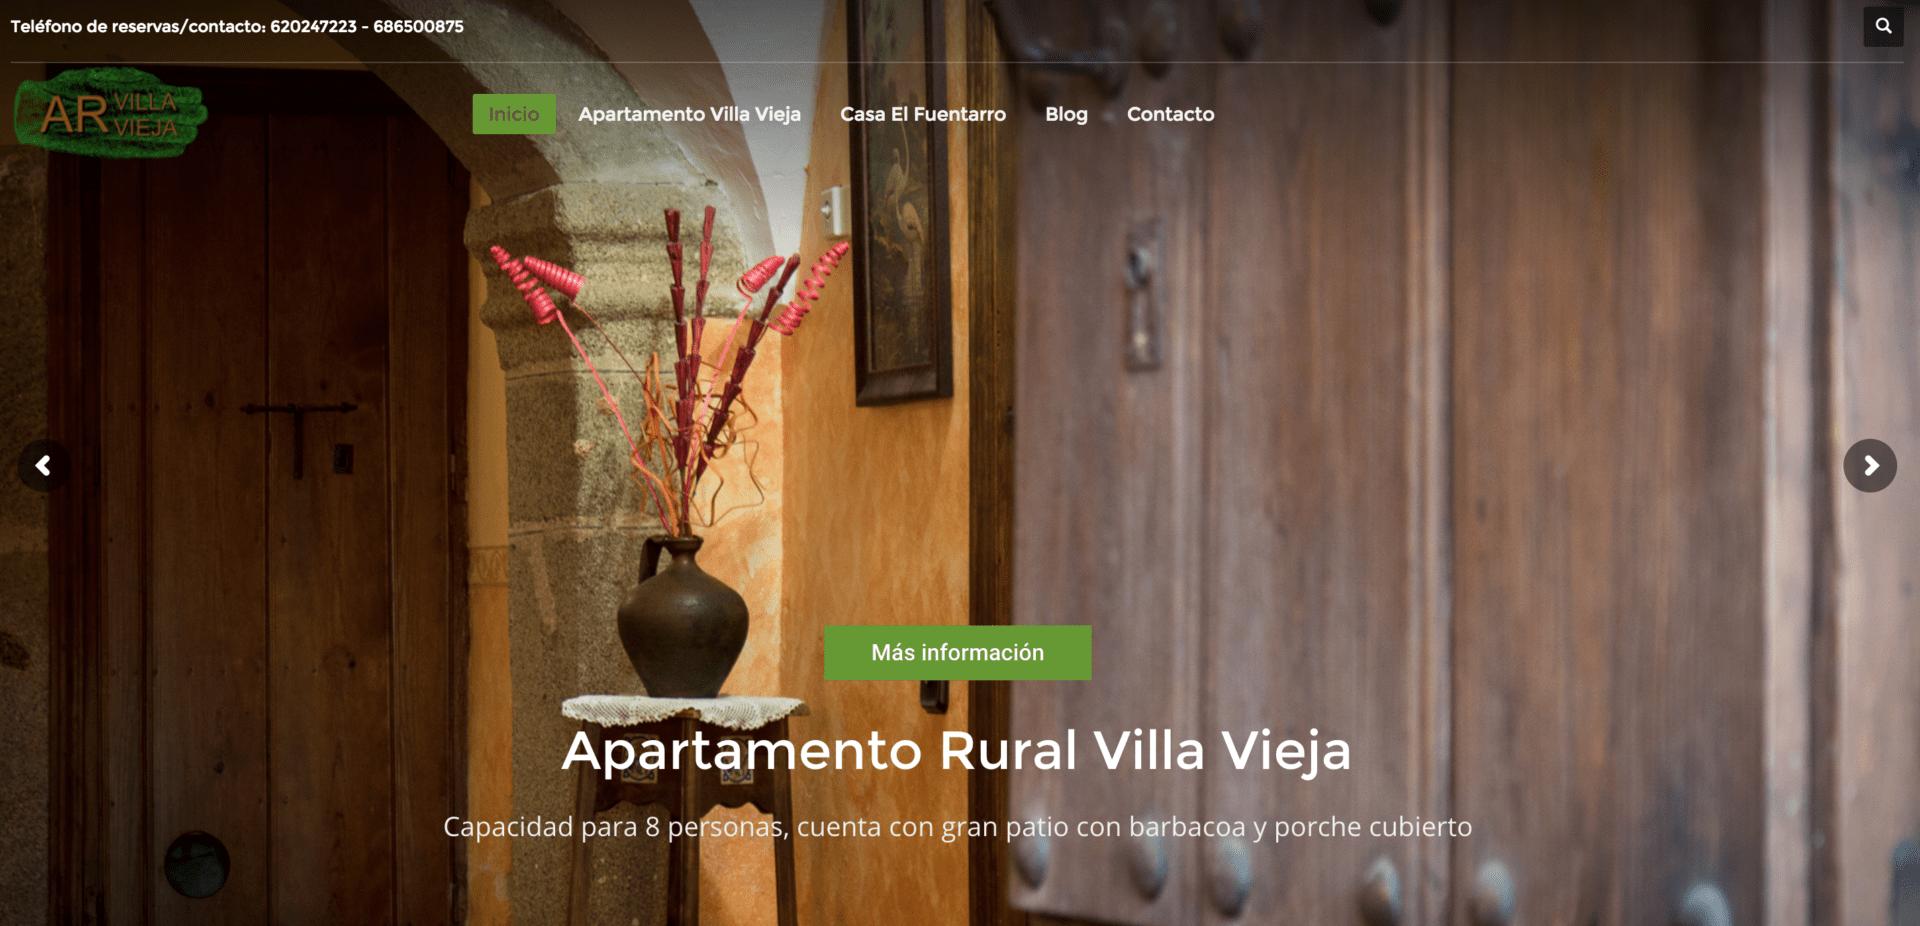 Diseño Web para AR Villa Vieja del Tamuja